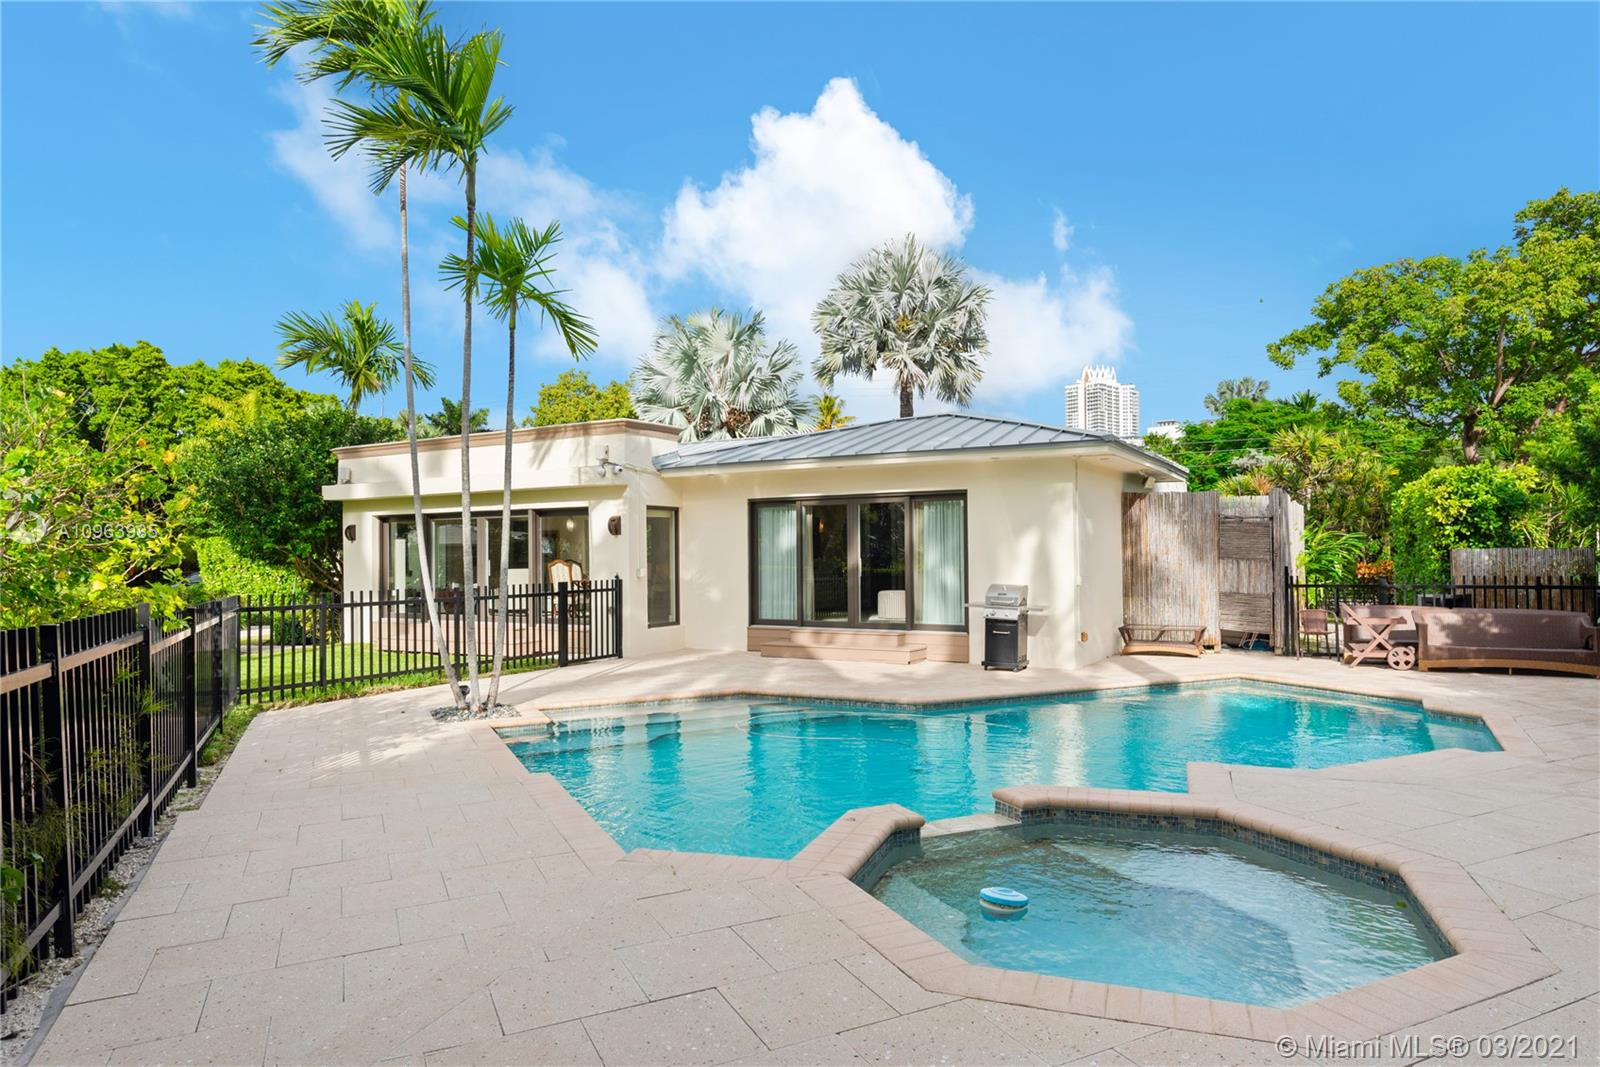 Beach View - 6120 La Gorce Dr, Miami Beach, FL 33140